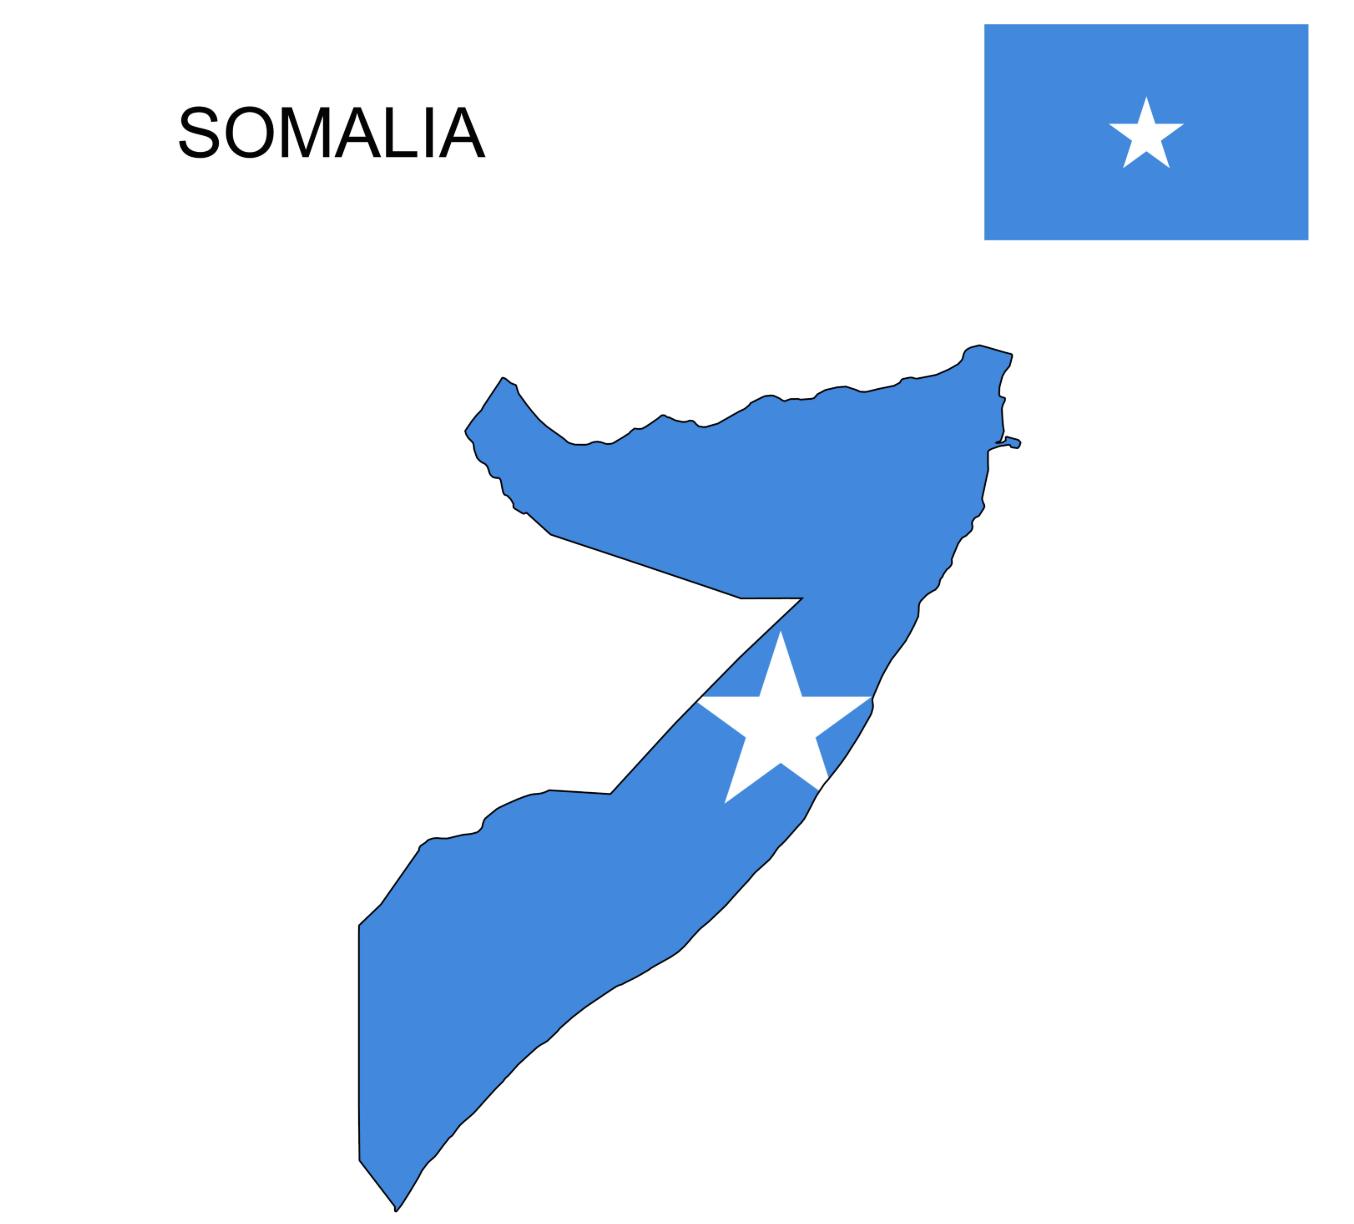 Somalia's Dysfunctional Clan-Federalism